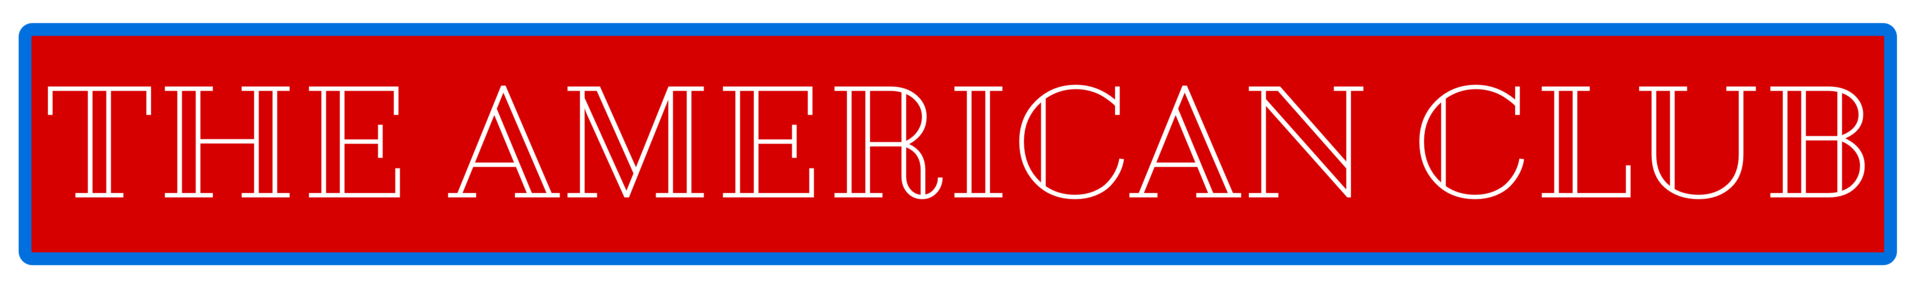 Tac long logo